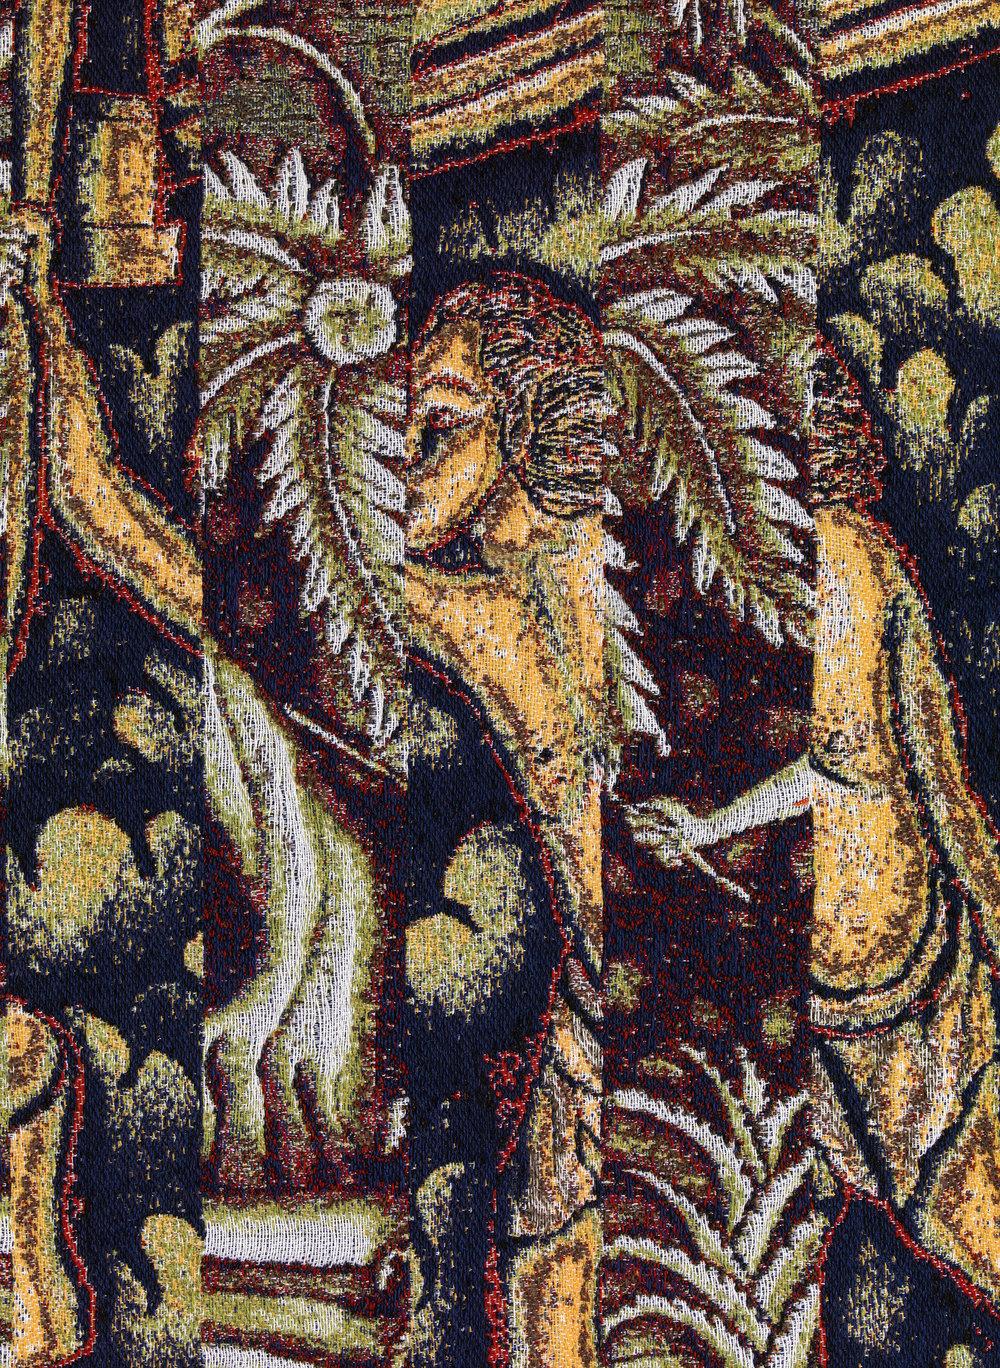 Batuan 2, jacquard woven, detail